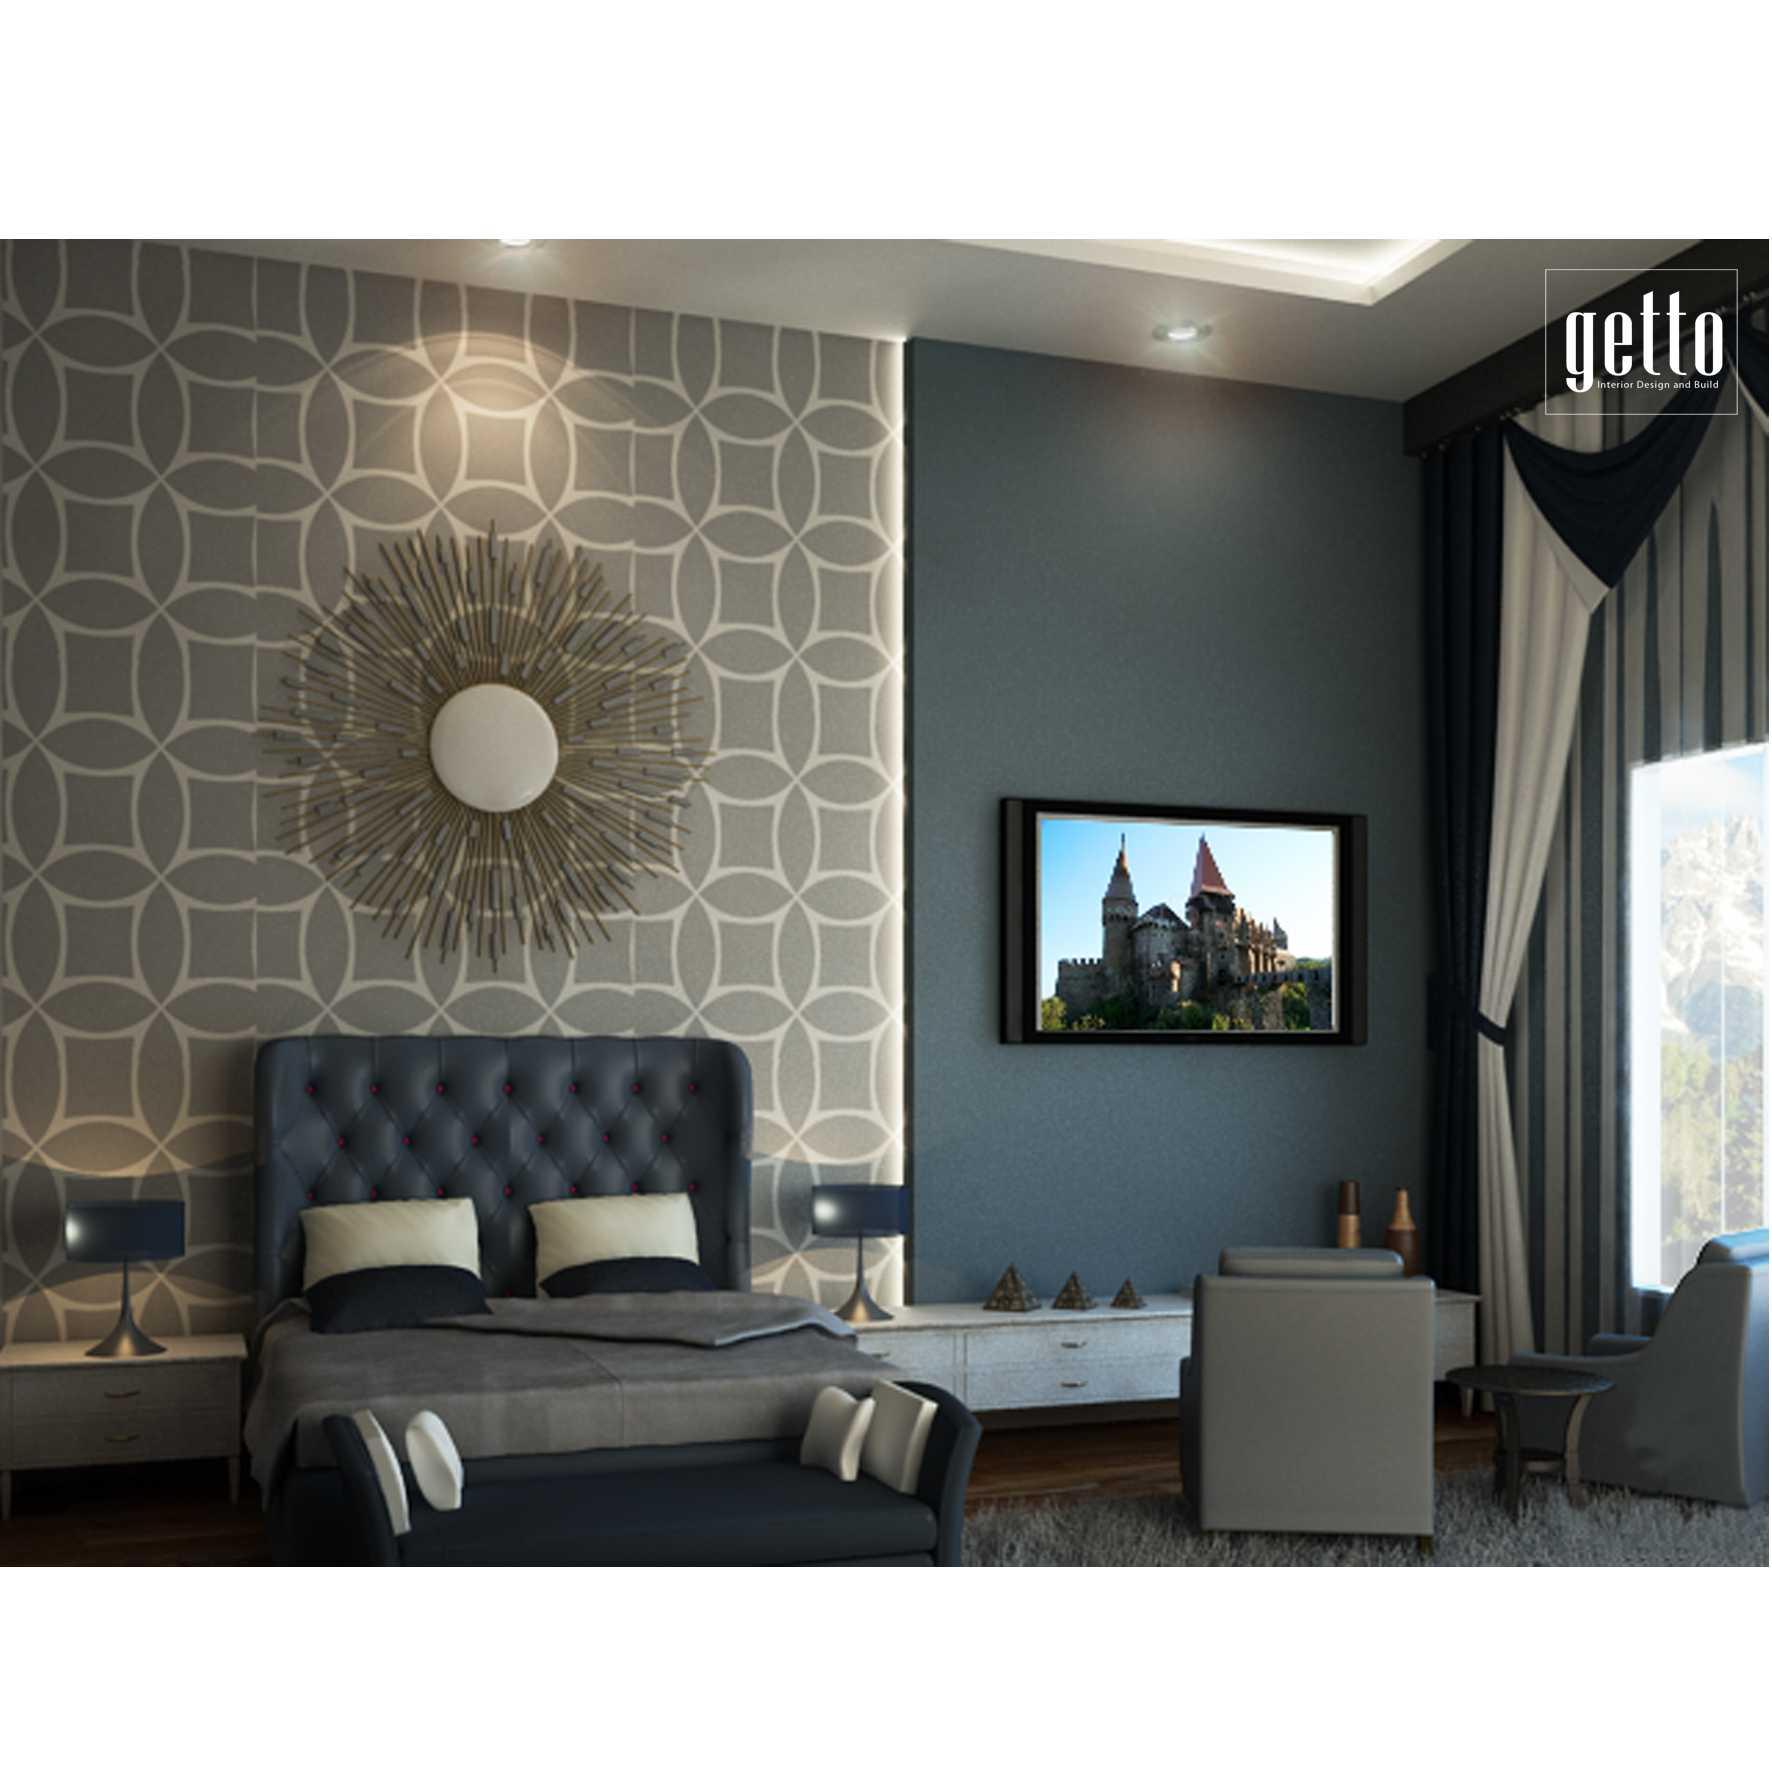 Getto Id Kota Metro Bandar Lampung Bandar Lampung Bedroom2 Modern  14314